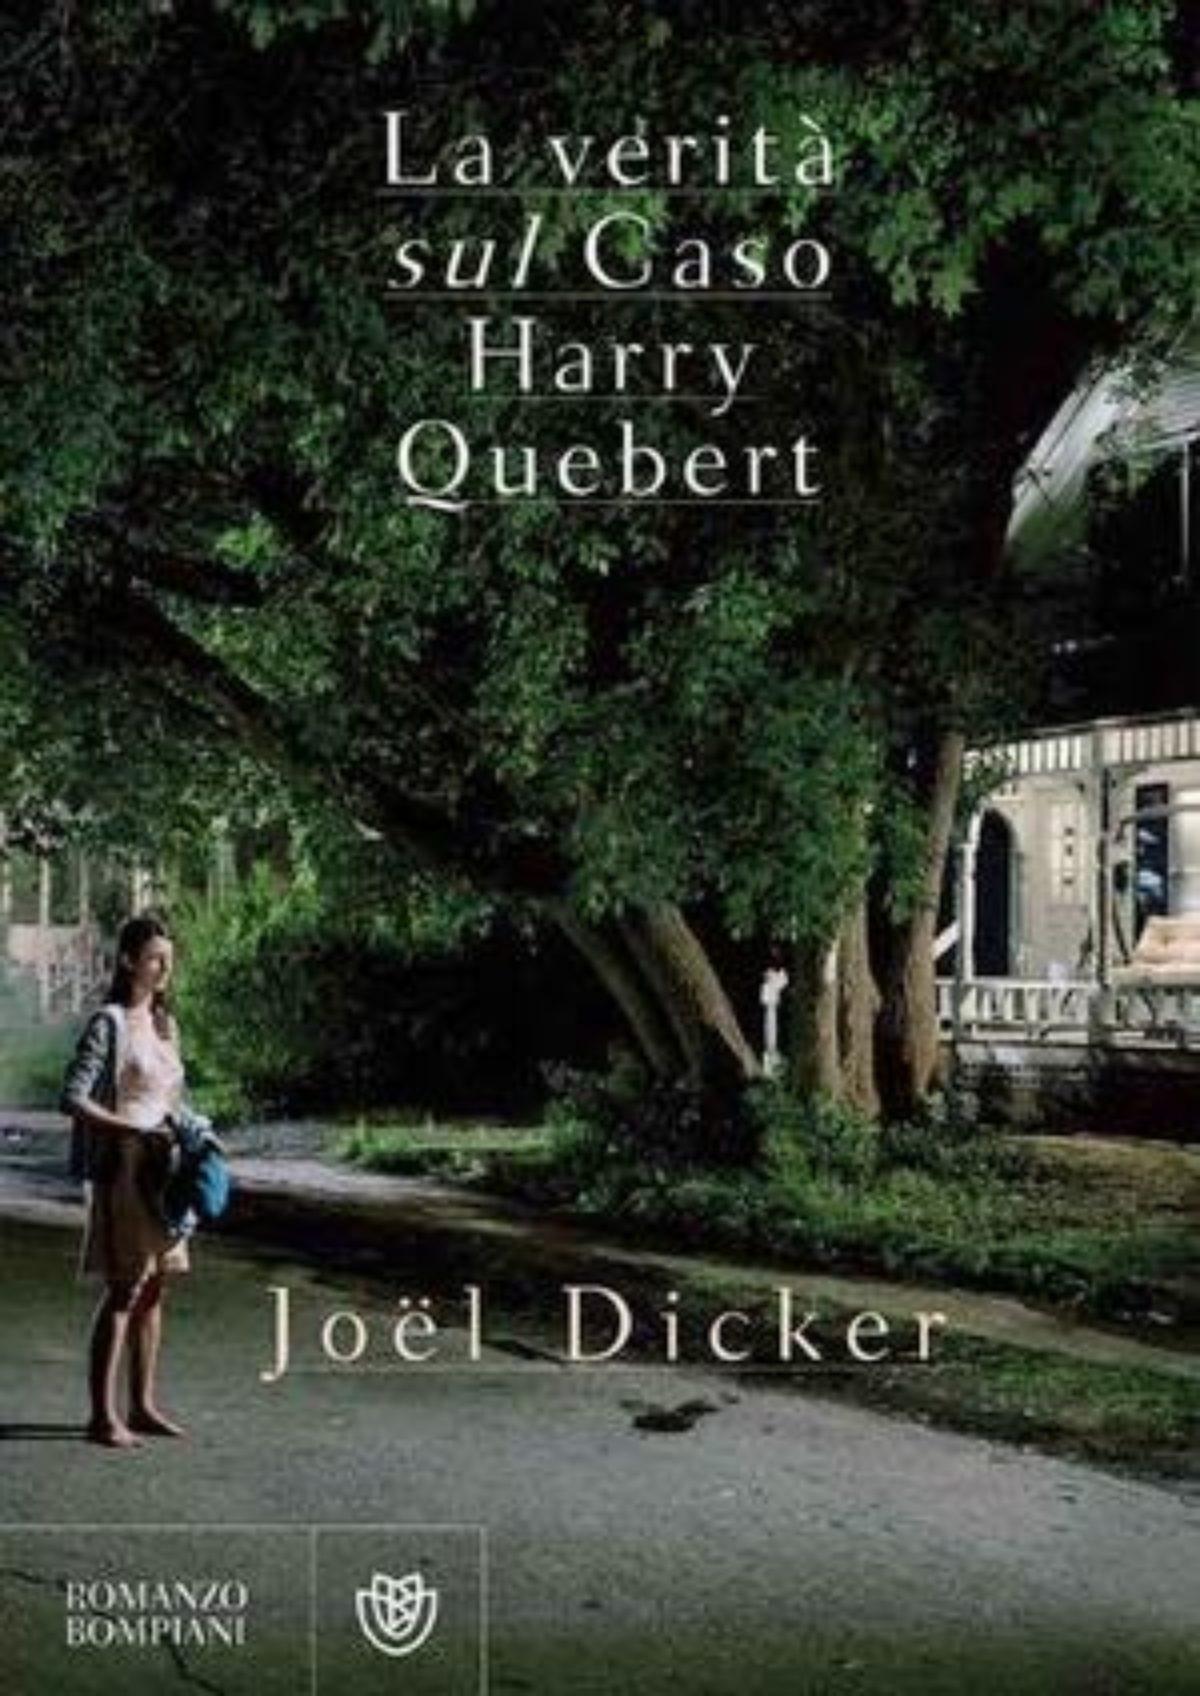 la verit%C3%A0 sul caso harry quebert libro  La verità sul caso Harry Quebert recensione | Di cosa parla | Bello ...